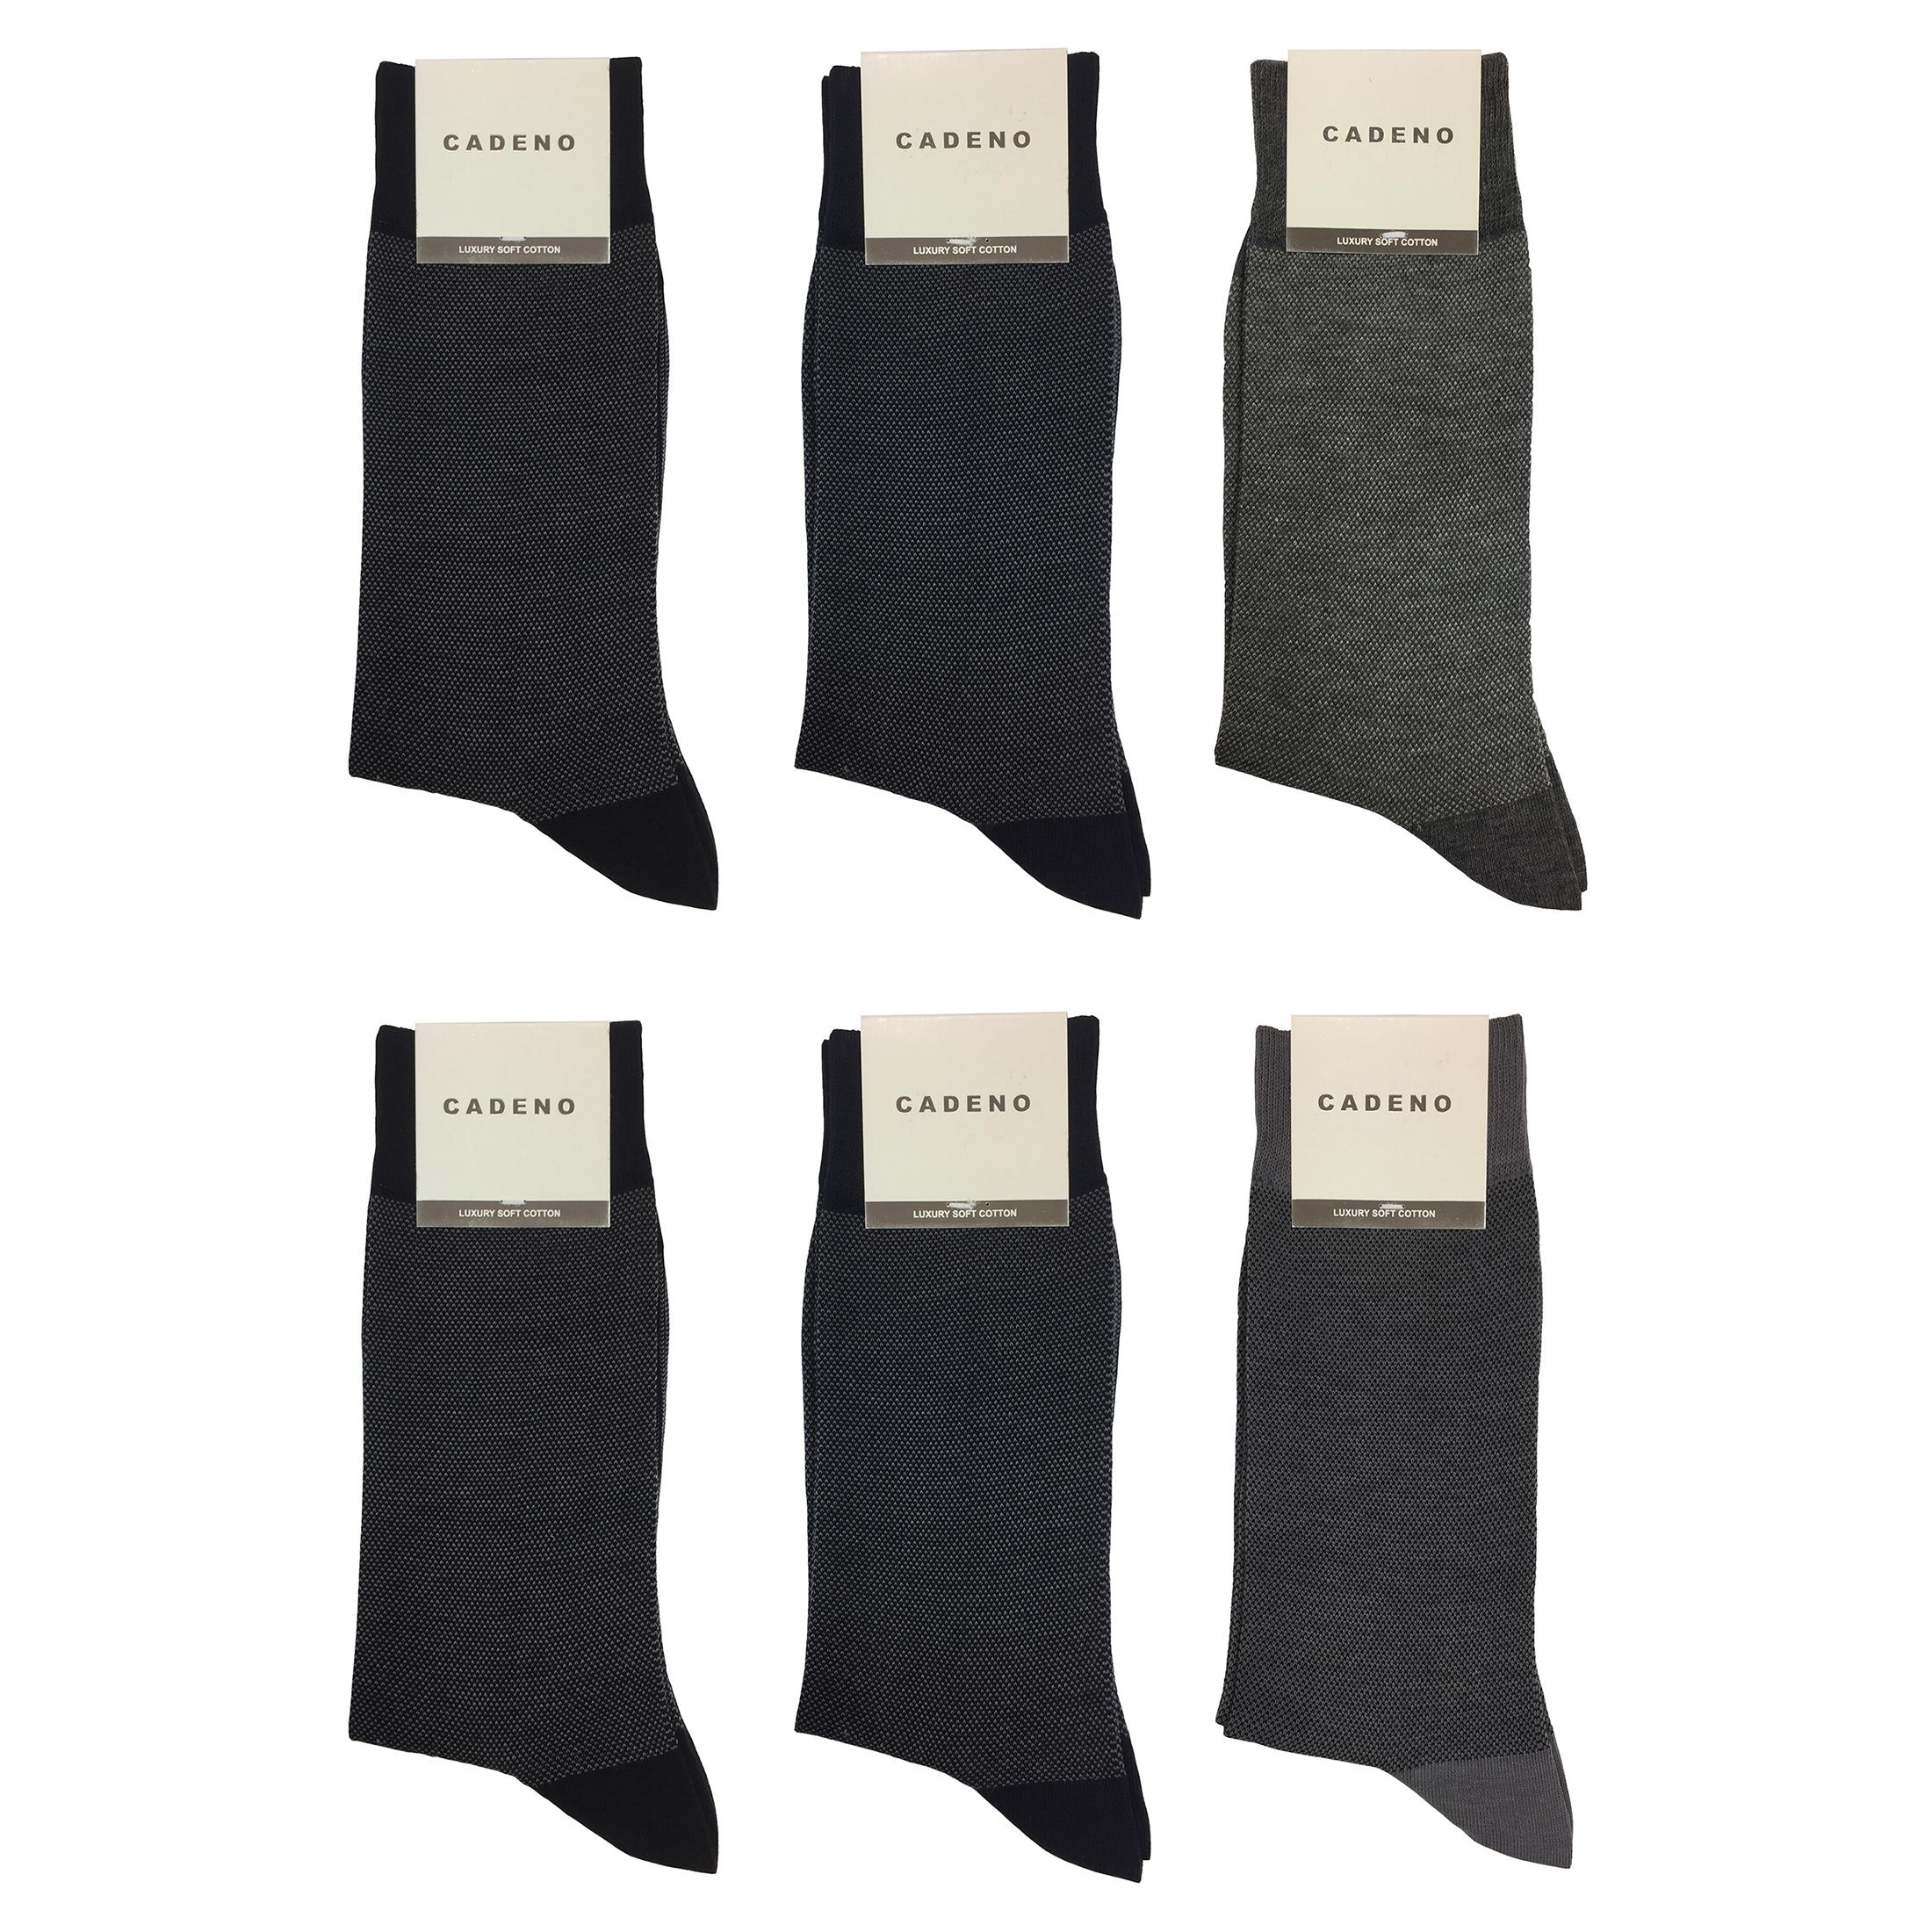 جوراب مردانه کادنو کد CAME1002 مجموعه 6 عددی -  - 2